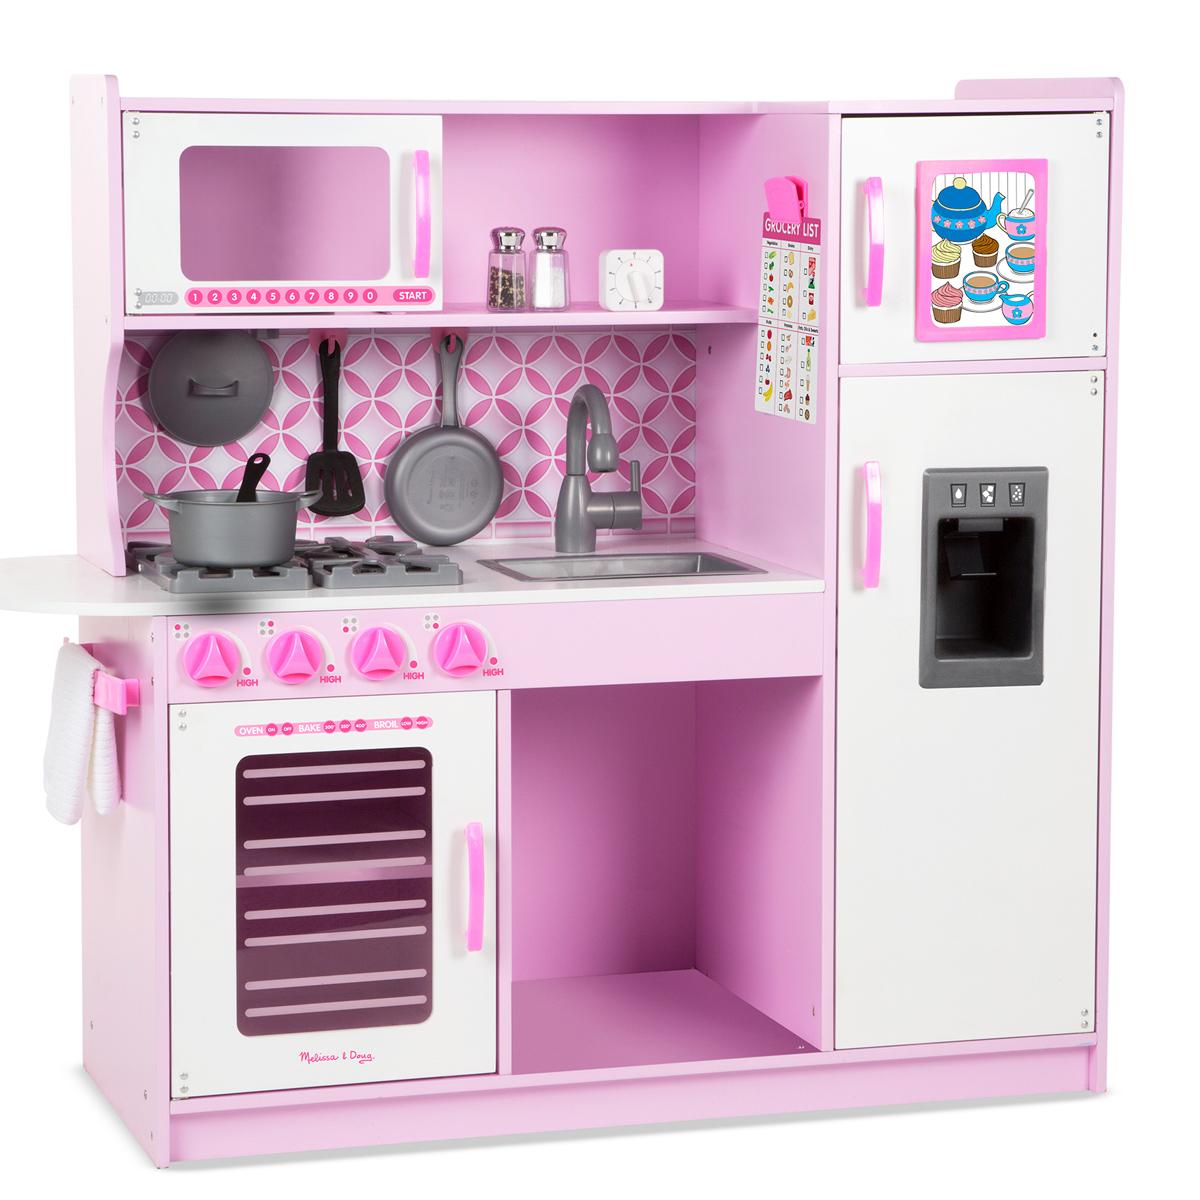 melissa doug kinderk che rosa 14002 pirum. Black Bedroom Furniture Sets. Home Design Ideas